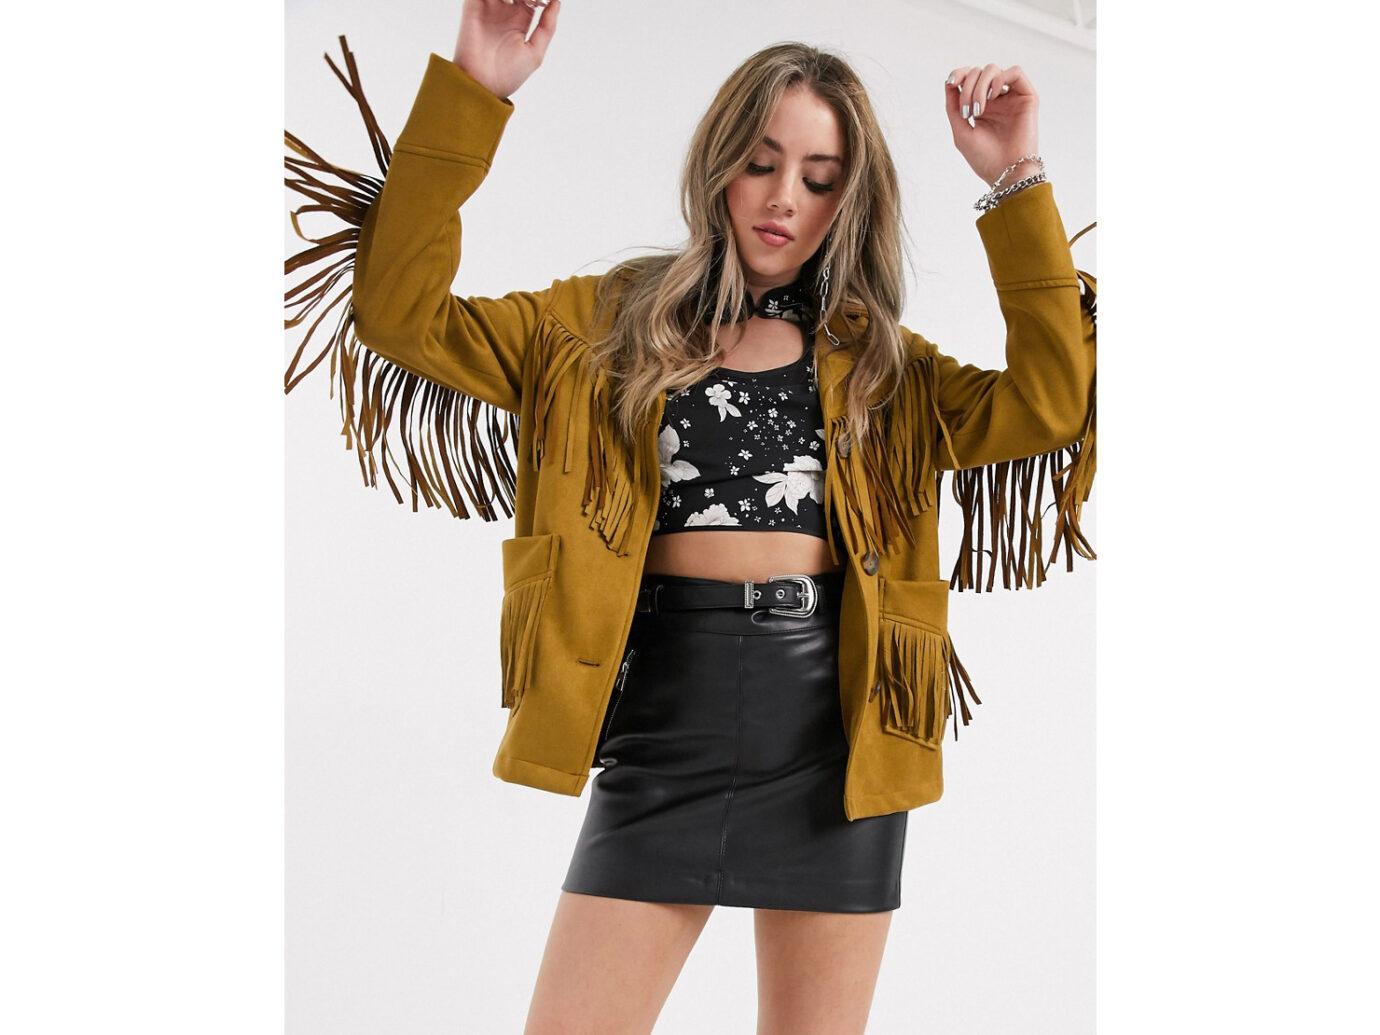 Save: Bershka fringed jacket in tan